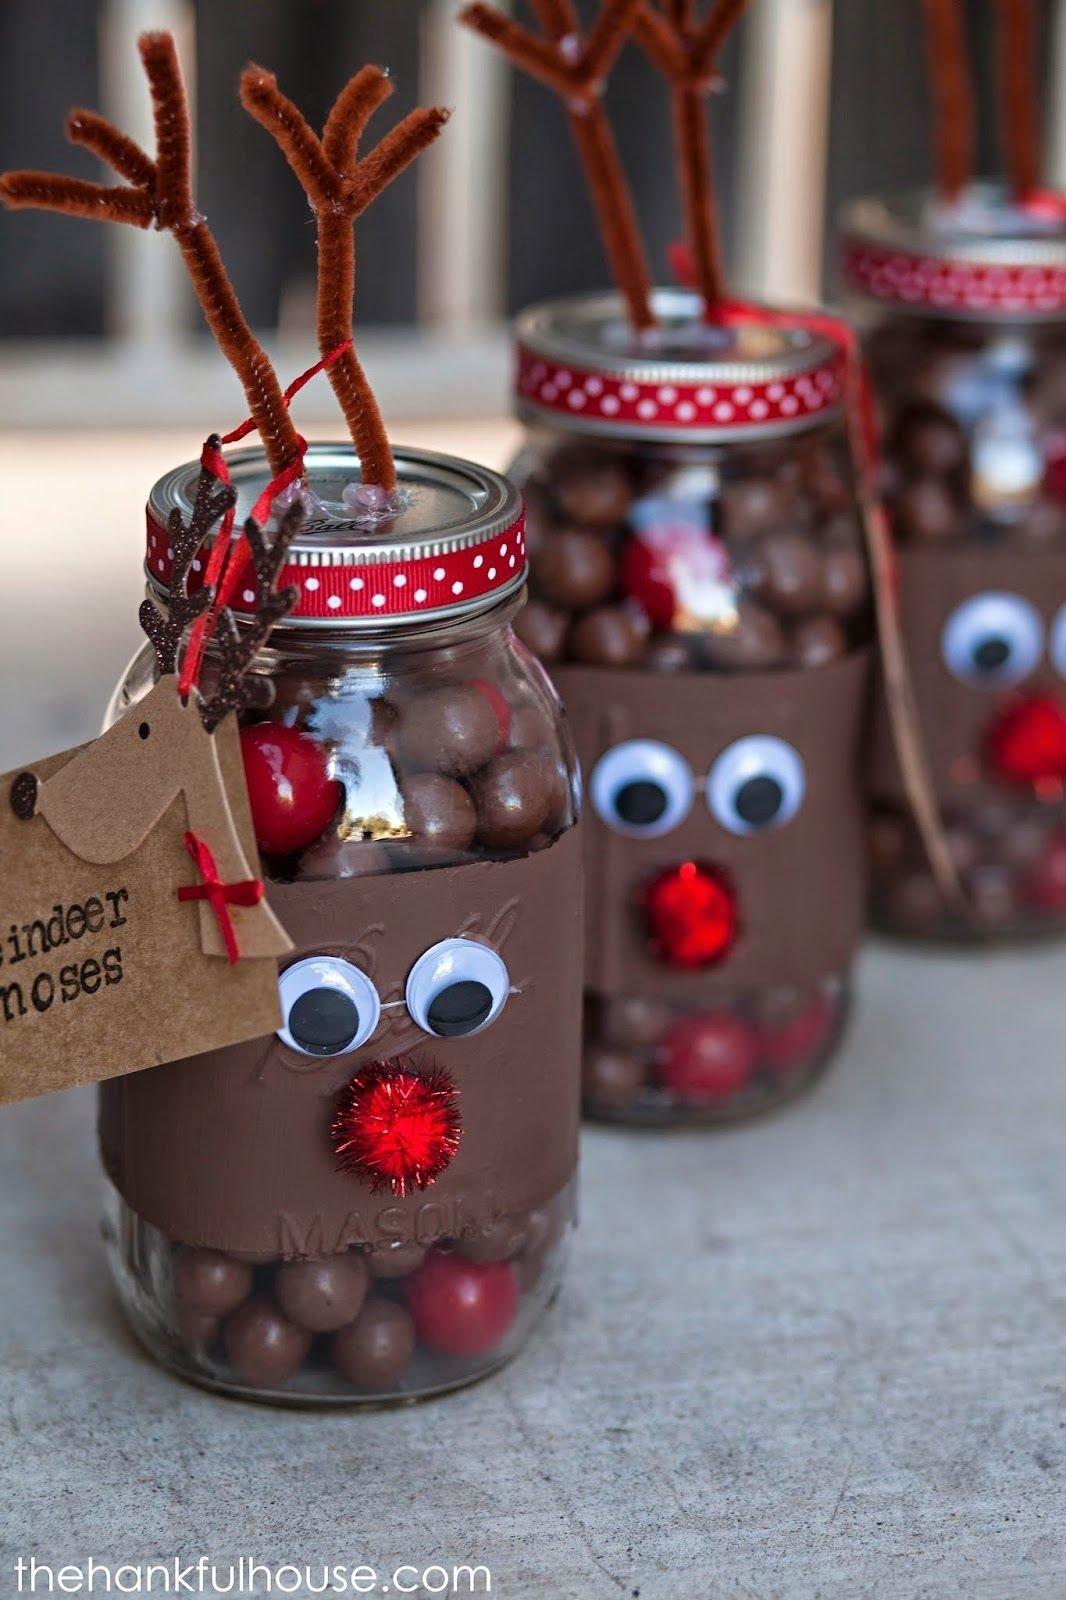 10 Attractive Pinterest Homemade Christmas Gift Ideas reindeer noses gift jars einmachglaser verziert als rentiere 1 2021